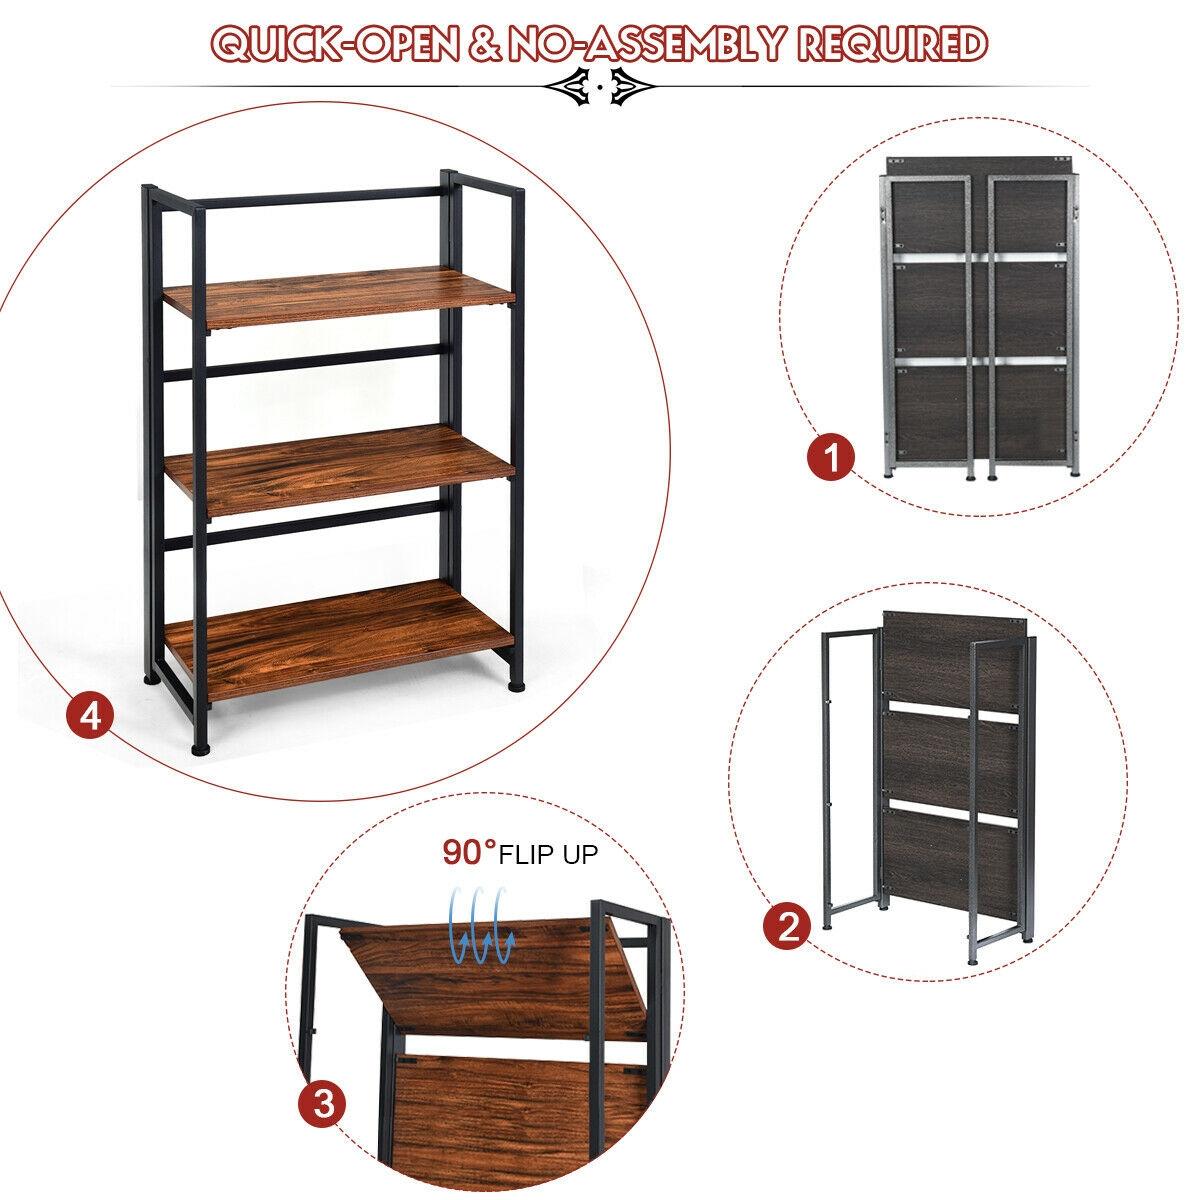 3-Tier Portable Display Folding Bookshelf Storage Shelf